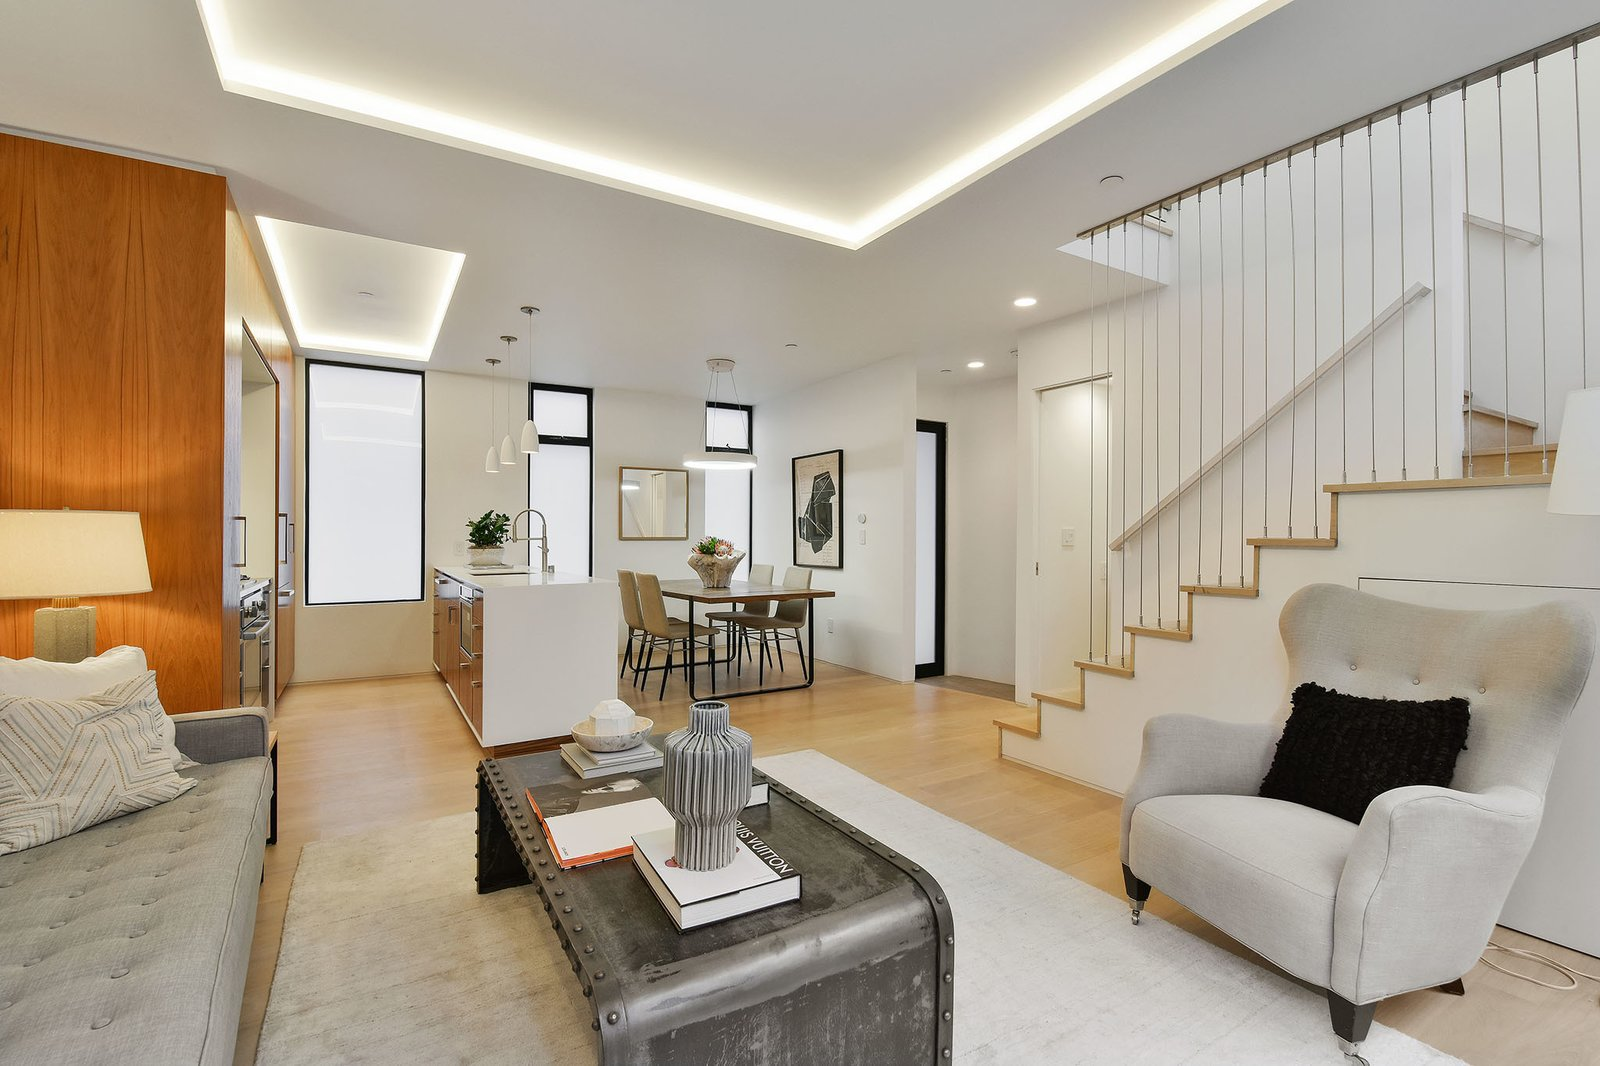 Living Room, Light Hardwood Floor, Ceiling Lighting, and Recessed Lighting  For Sale: 188 Quane Street